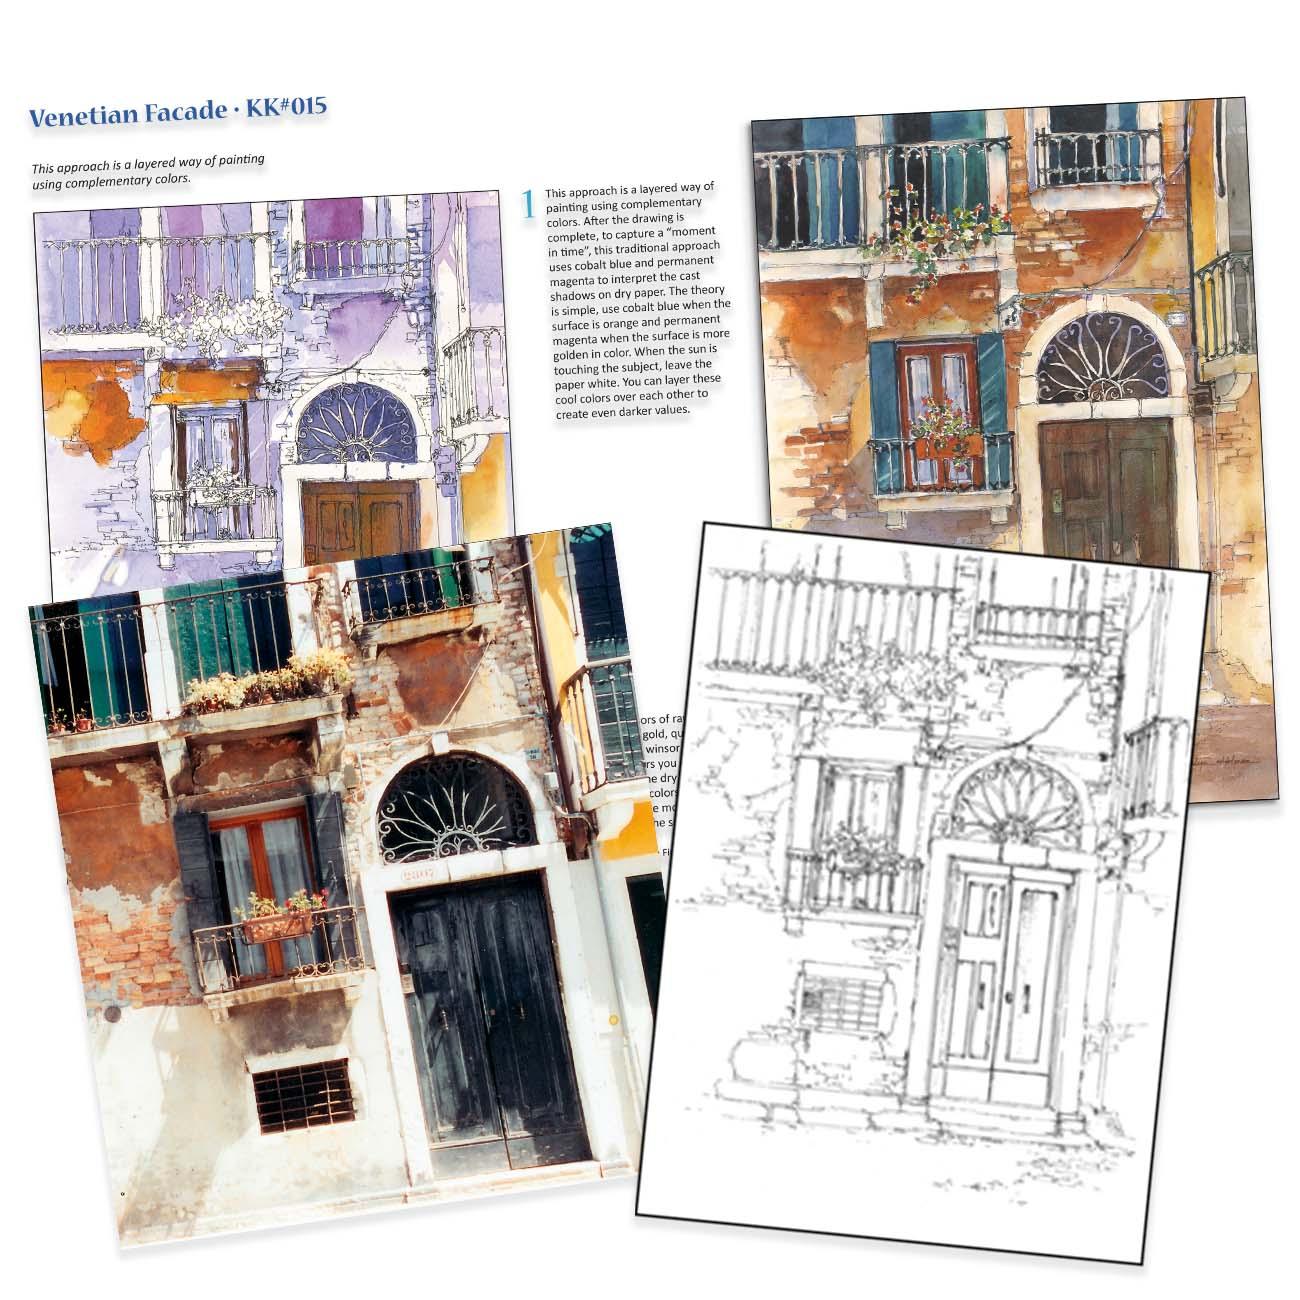 KK015 Venetian Facade